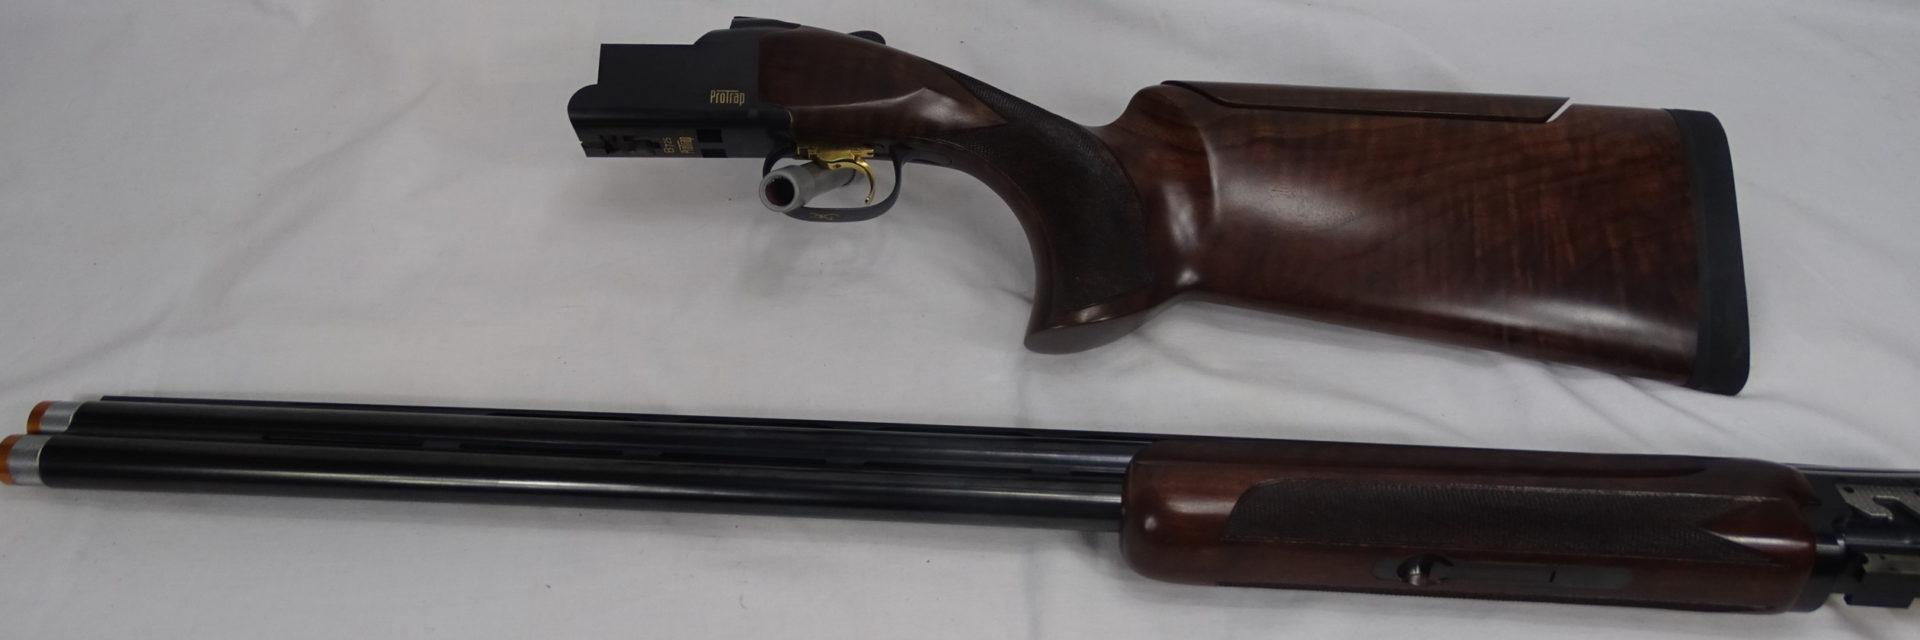 Browning B725 Pro Trap In Uitmuntende Staat. Kal 12.In Originele Koffer Met Alle Toebehoren.Prijs 2700€ T651